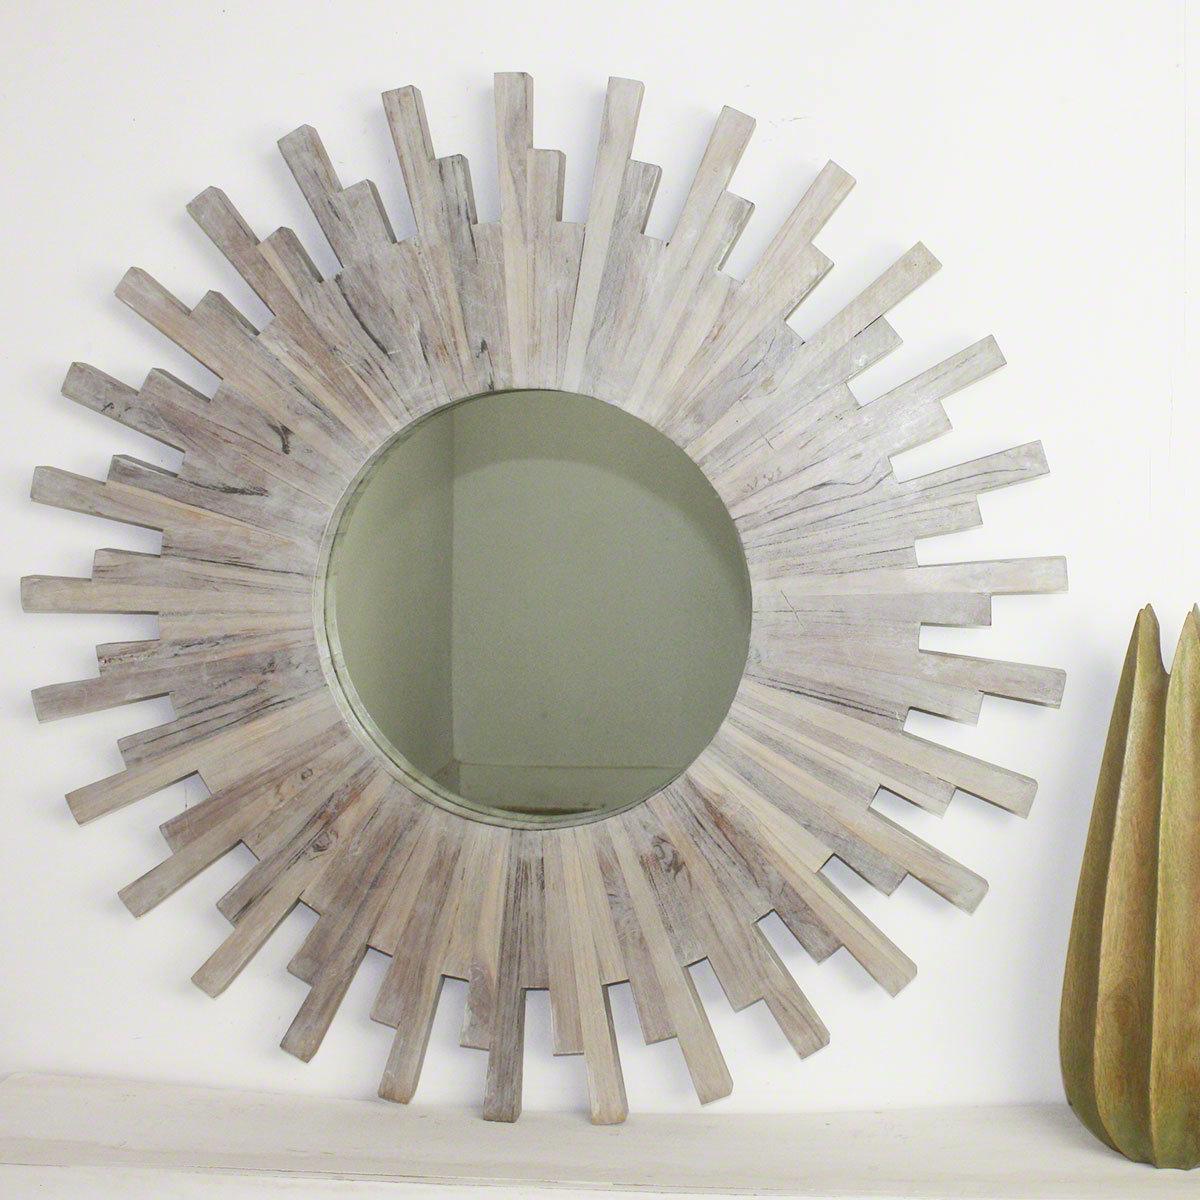 Perillo Burst Wood Accent Mirrors In Famous Deshazo Branch Modern & Contemporary Accent Mirror (Gallery 6 of 20)